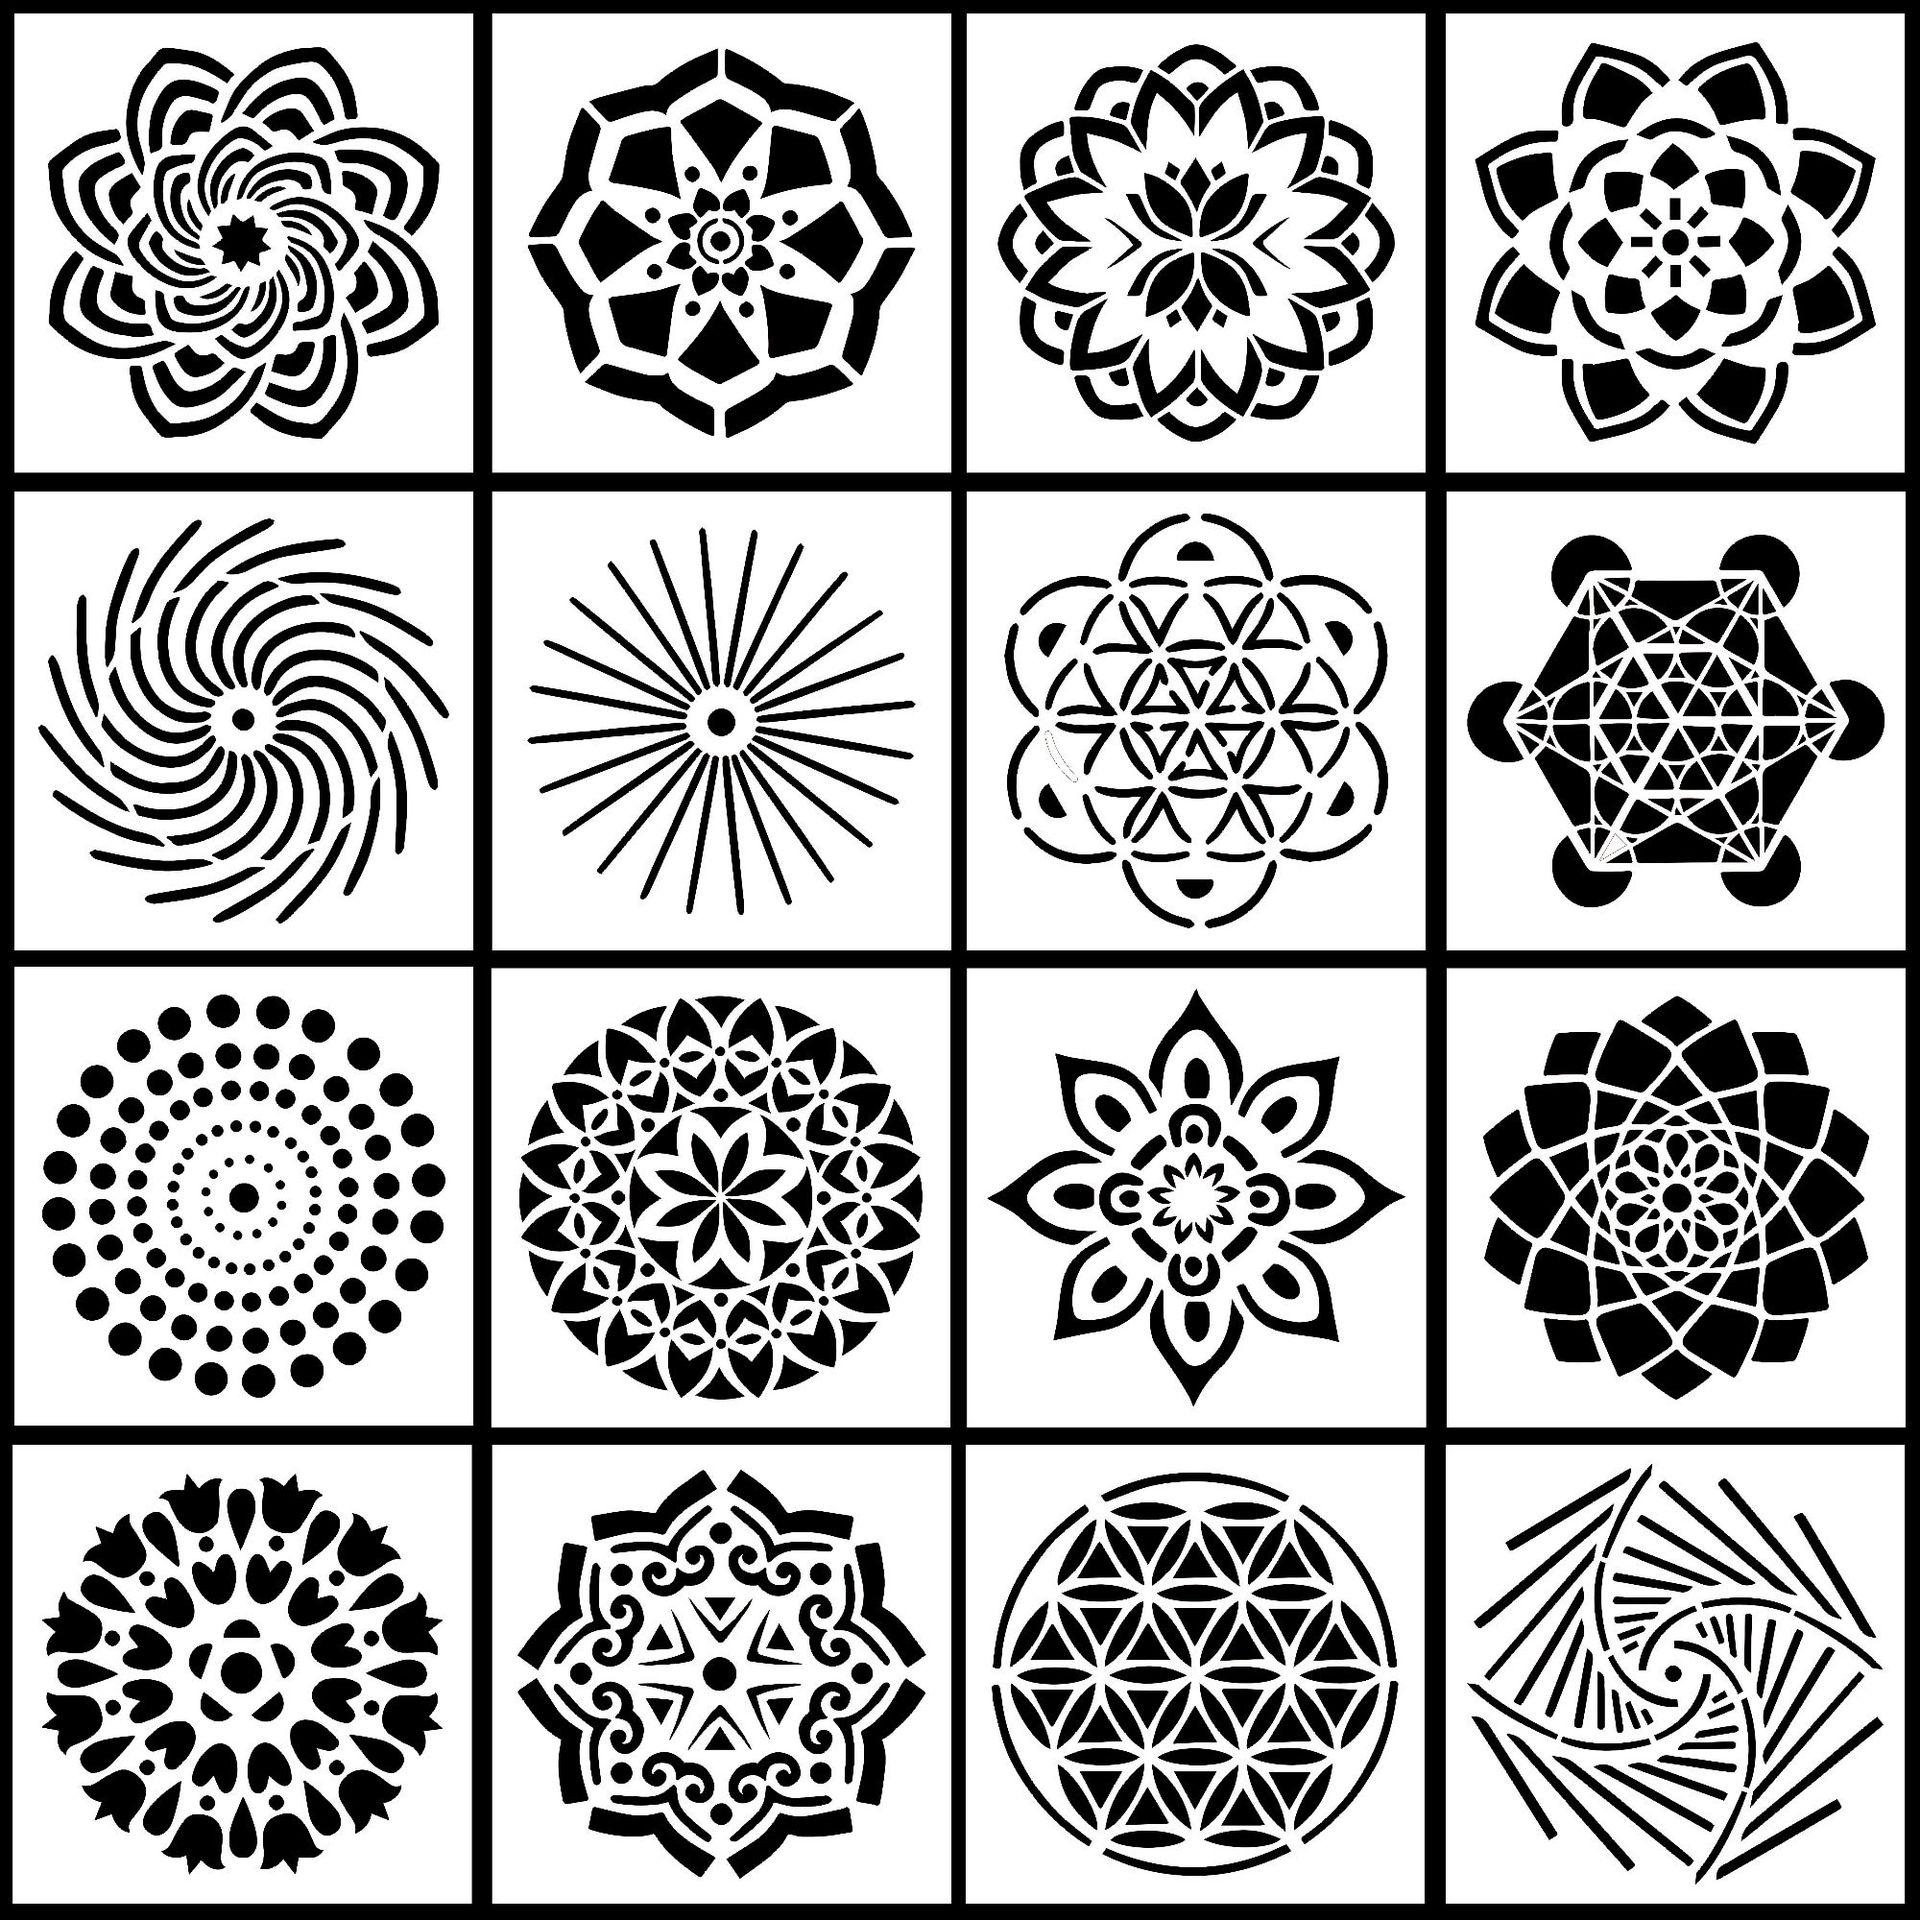 16Pcs/Set 13cm Mandala Geometry DIY Layering Stencils Painting Scrapbook Coloring Embossing Album Decorative Template